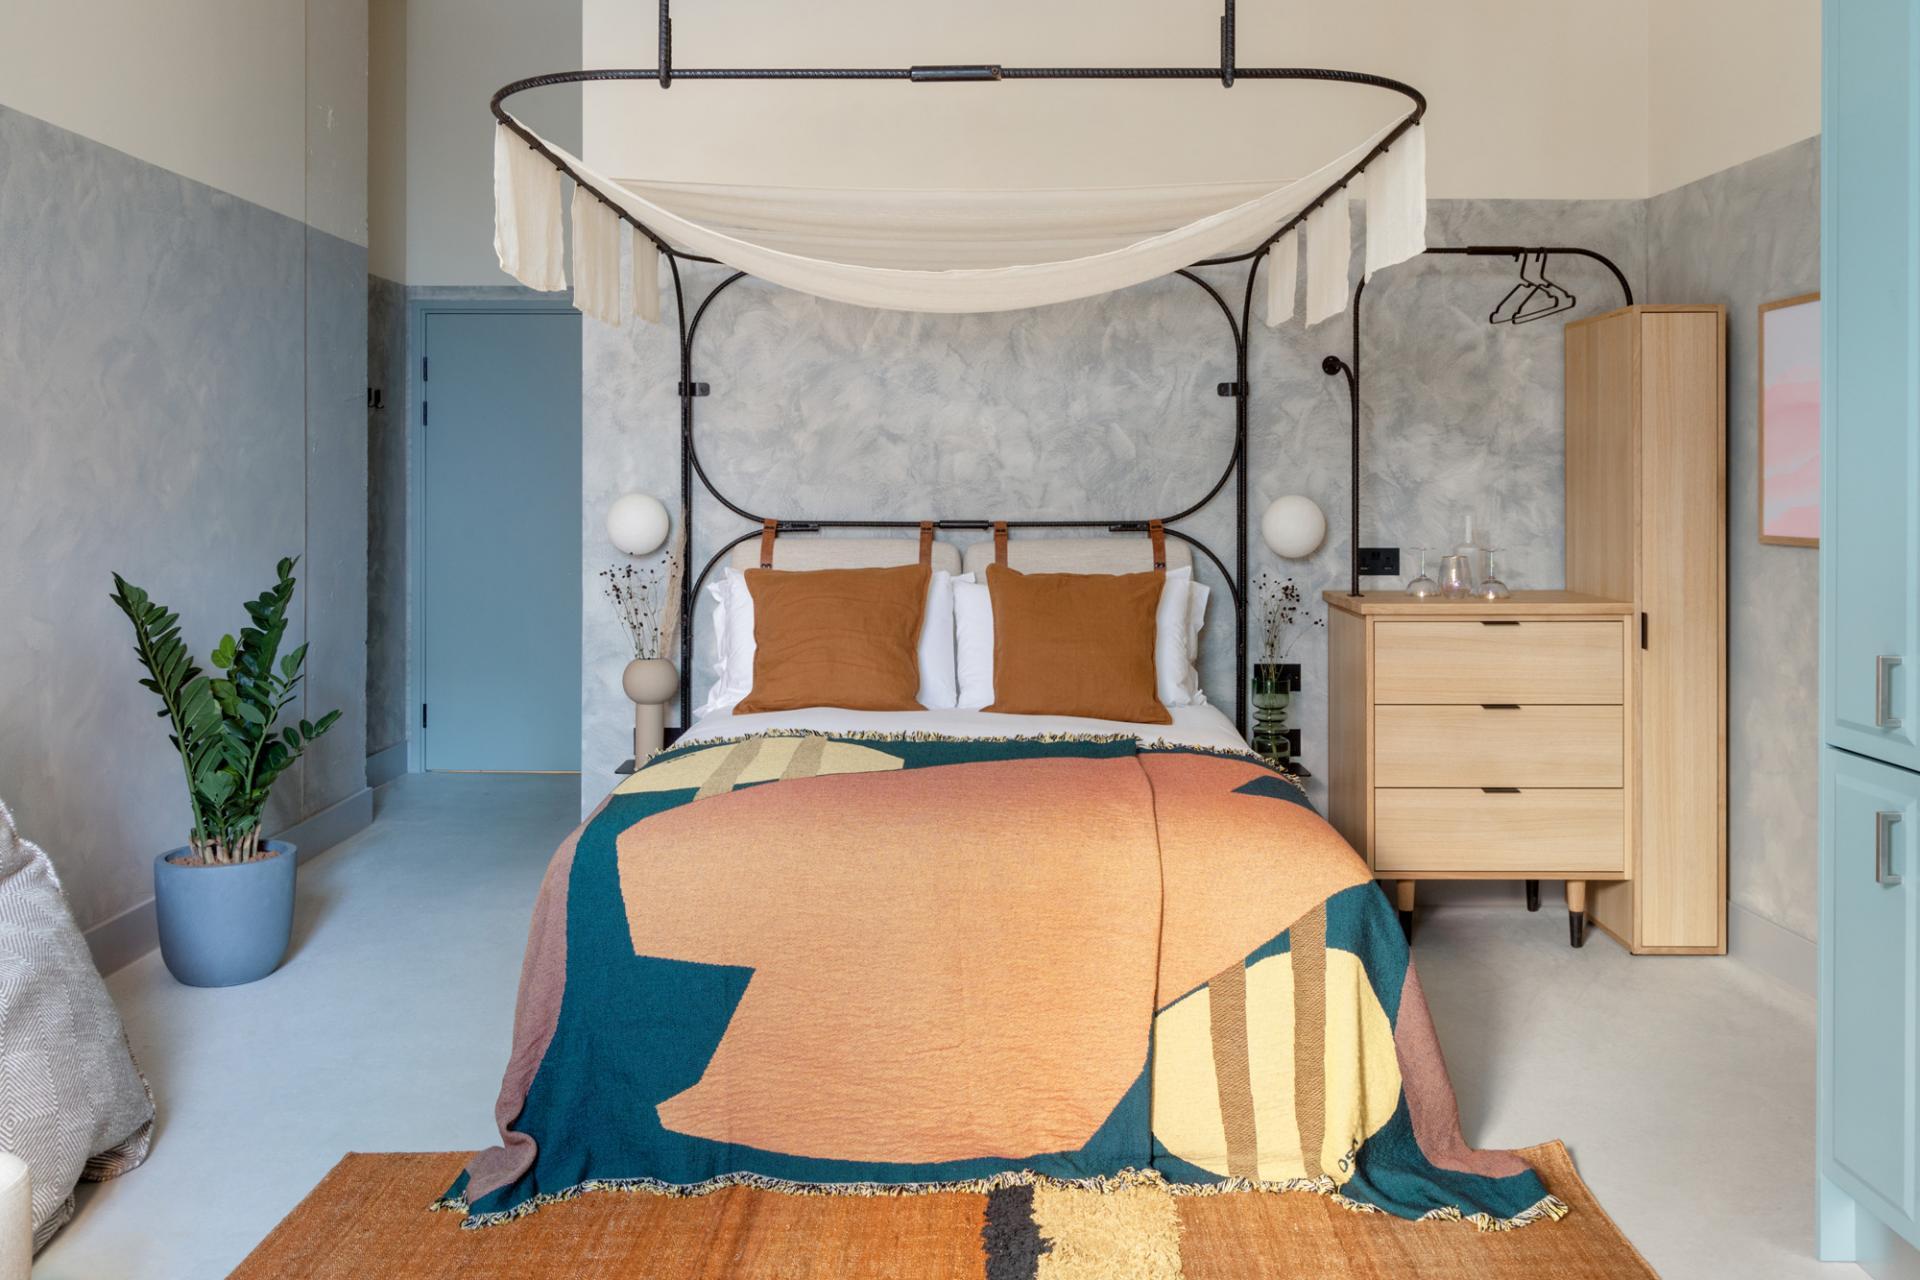 Bed at Bermonds Locke, St Saviours Estate, London